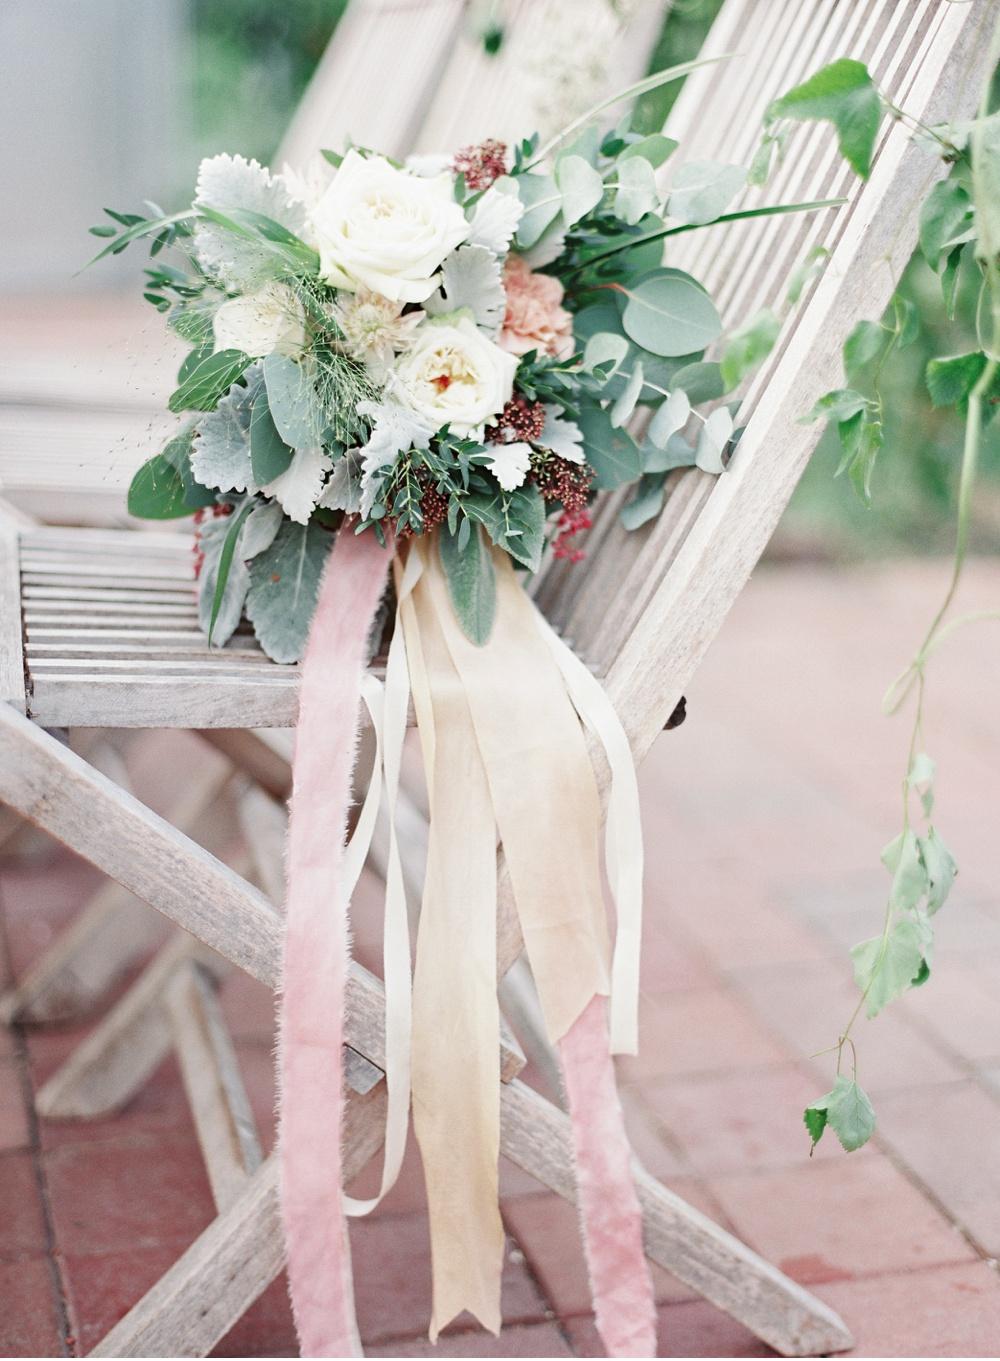 Greenhouse_wedding_inspiration©MadalinaSheldon_0005.jpg